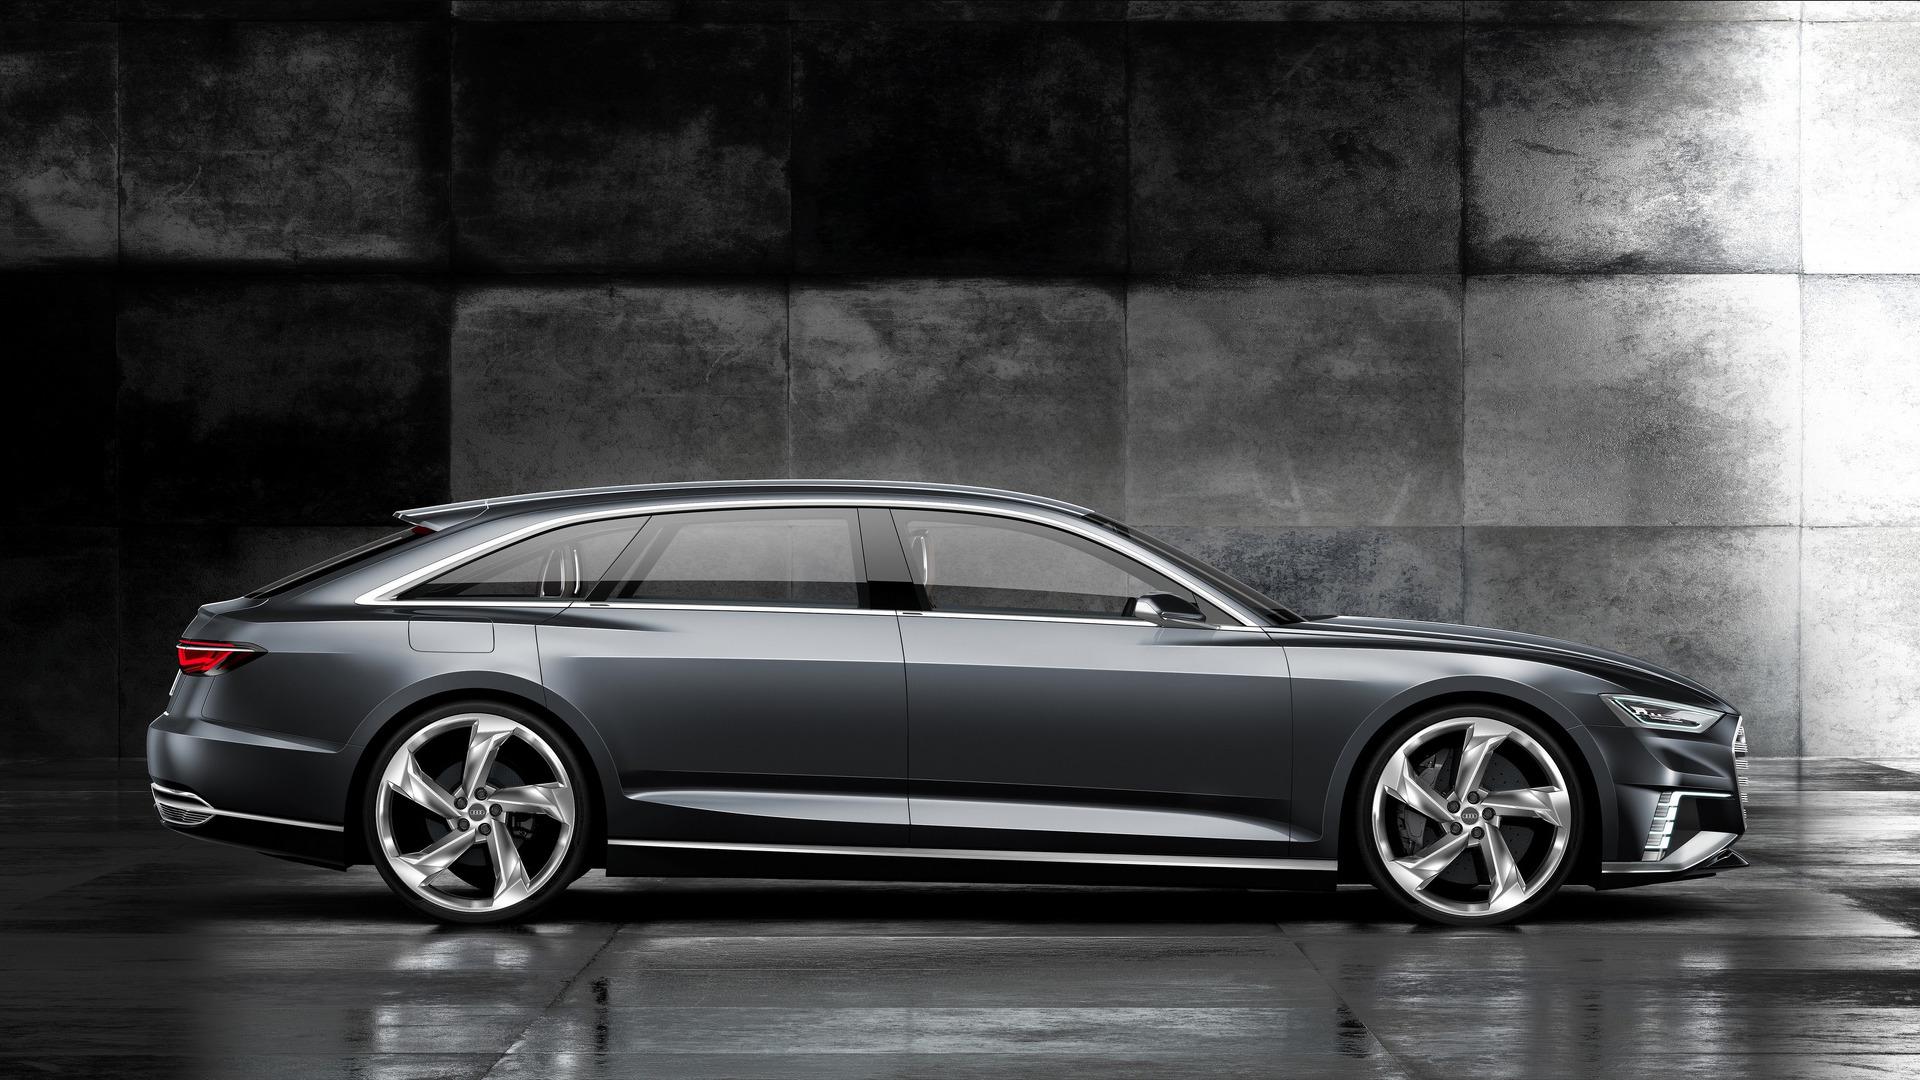 Audi A6 Avant 2018 >> 2018 Audi A6 Avant Render Shows Great Potential For Sleek Wagon